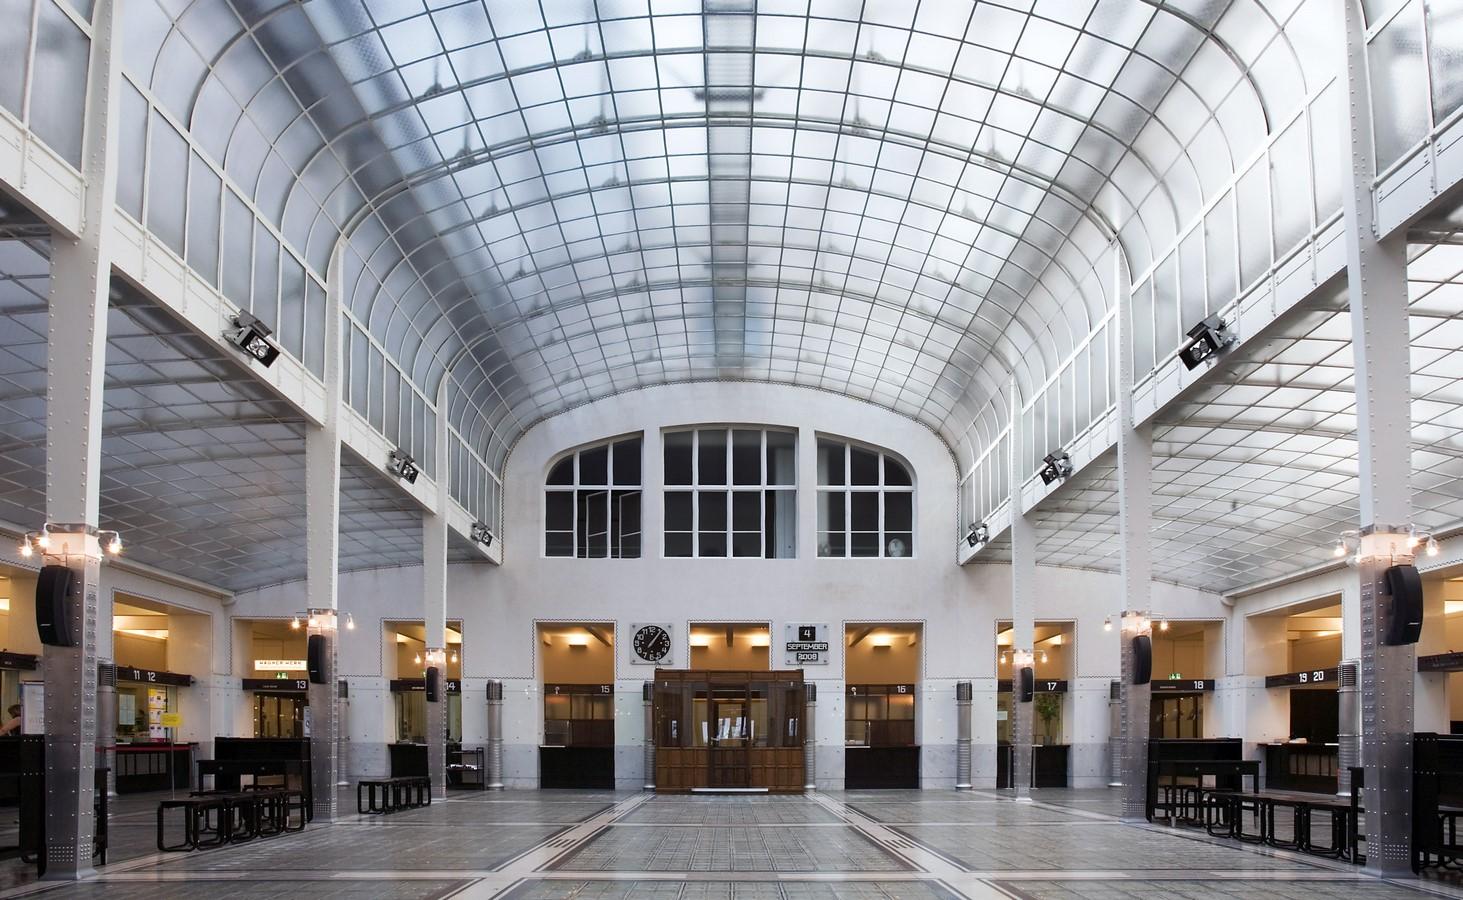 The Postal Savings Bank, Georg-Coch-Platz 2, 1010 Wien, Austria - Sheet1